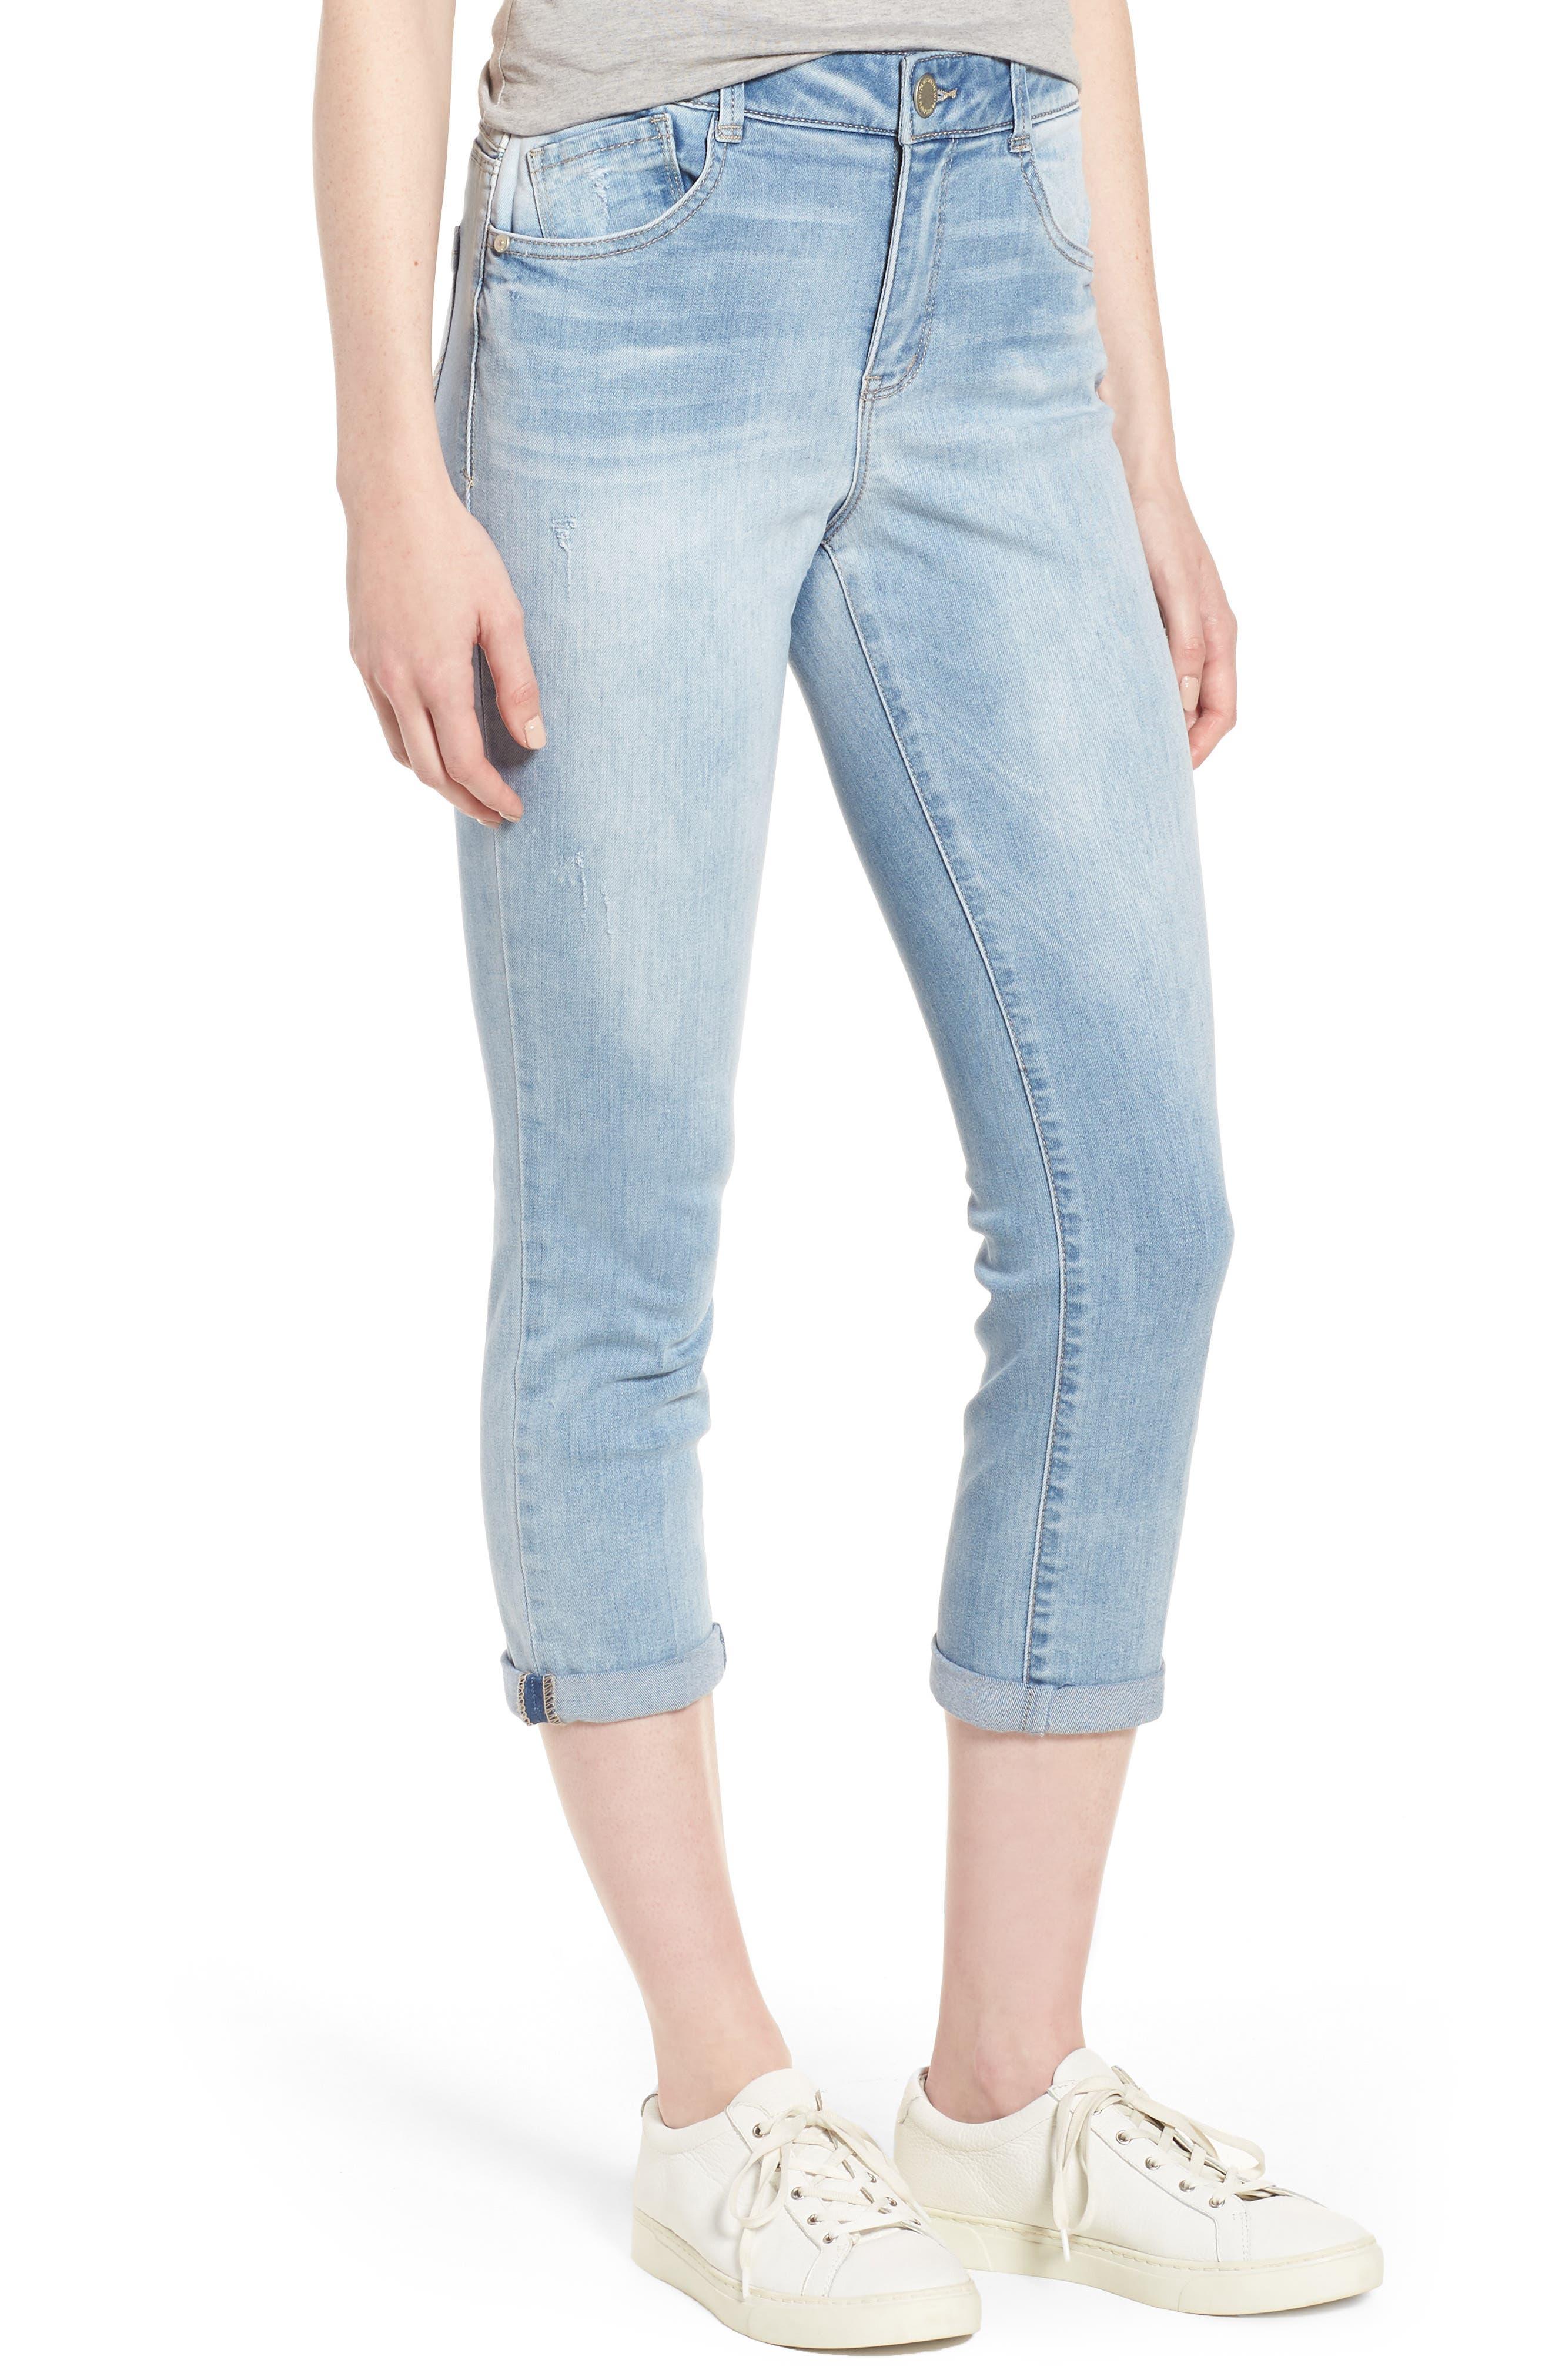 Ab-solution High Rise Crop Jeans,                             Main thumbnail 1, color,                             Light Blue